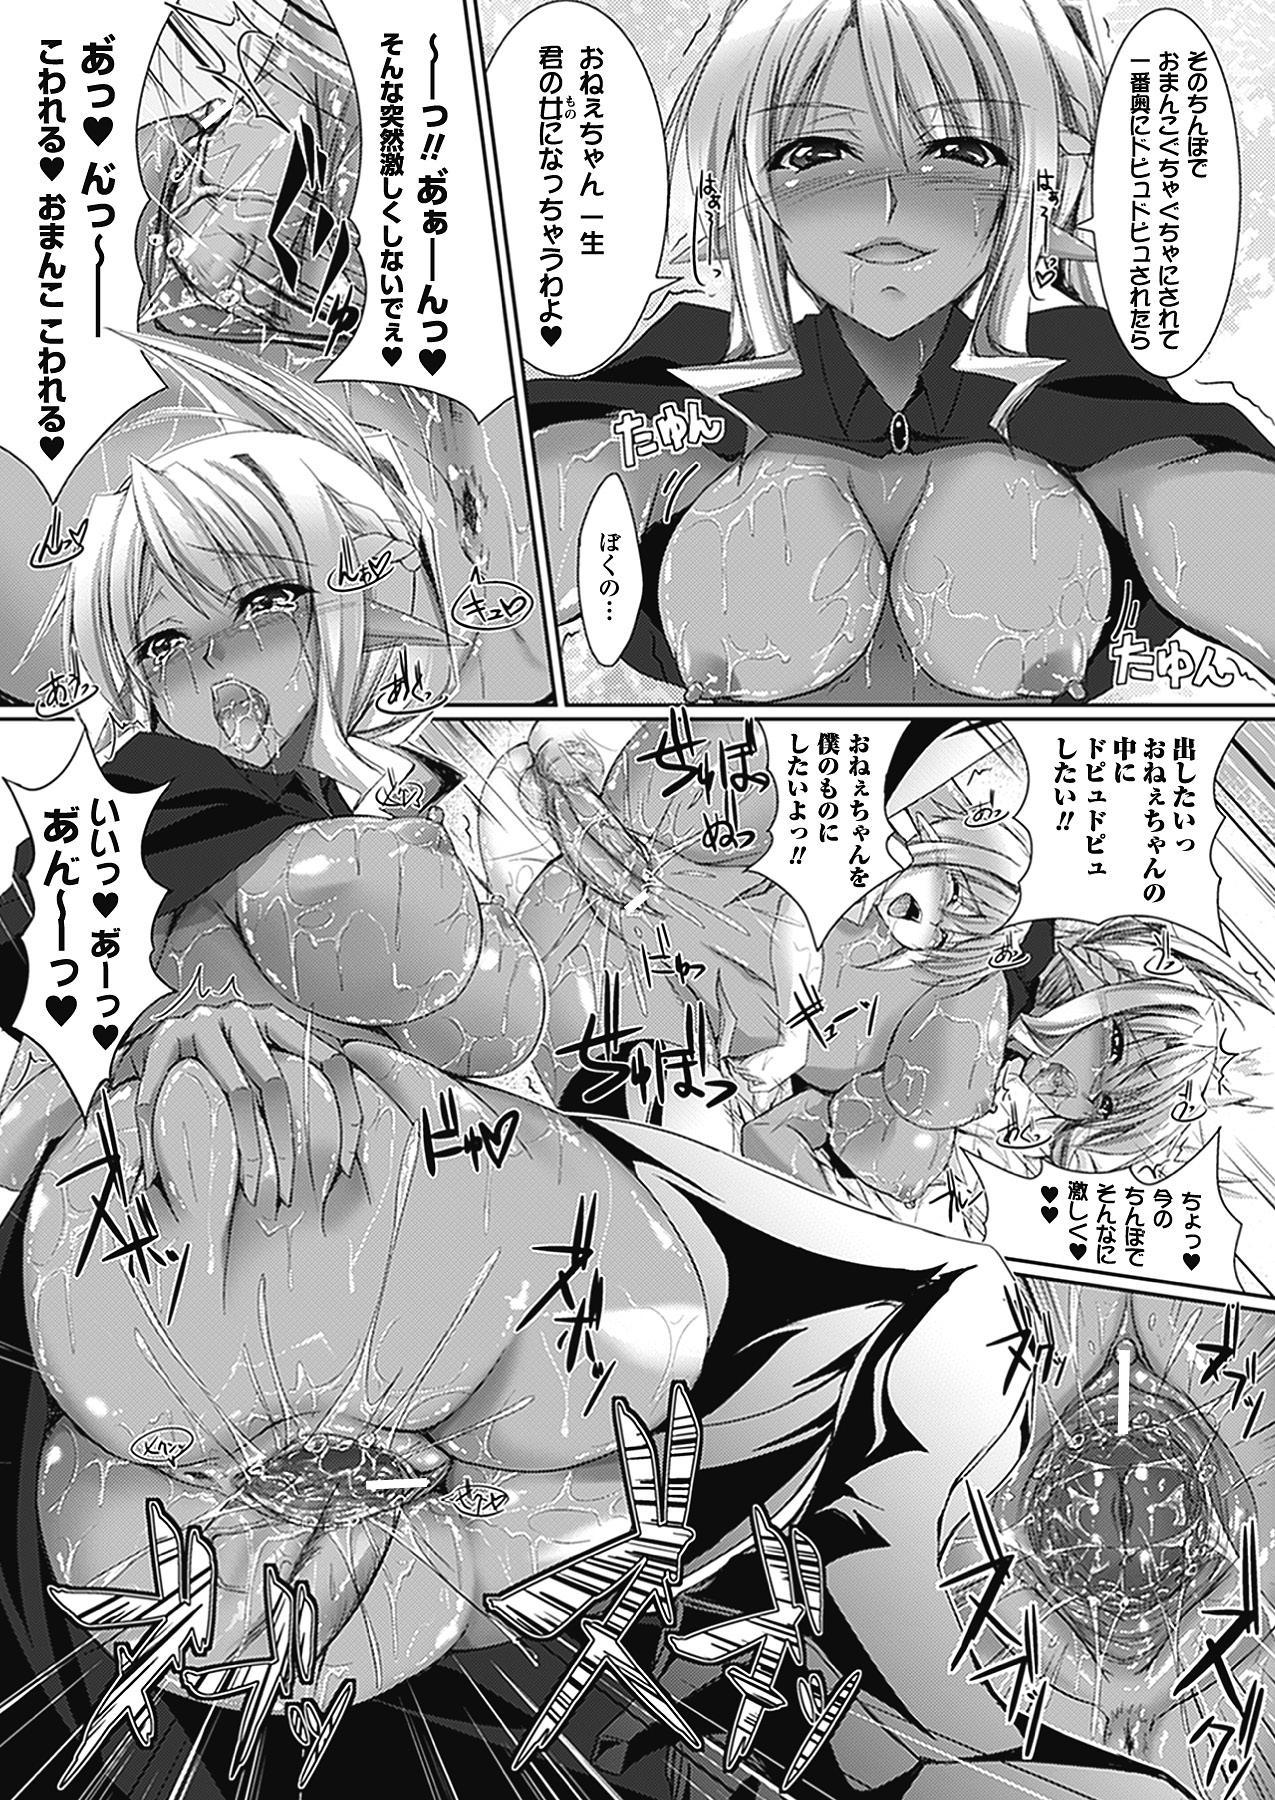 Amai Kuchibiru Torokeru Kuchibiru 100